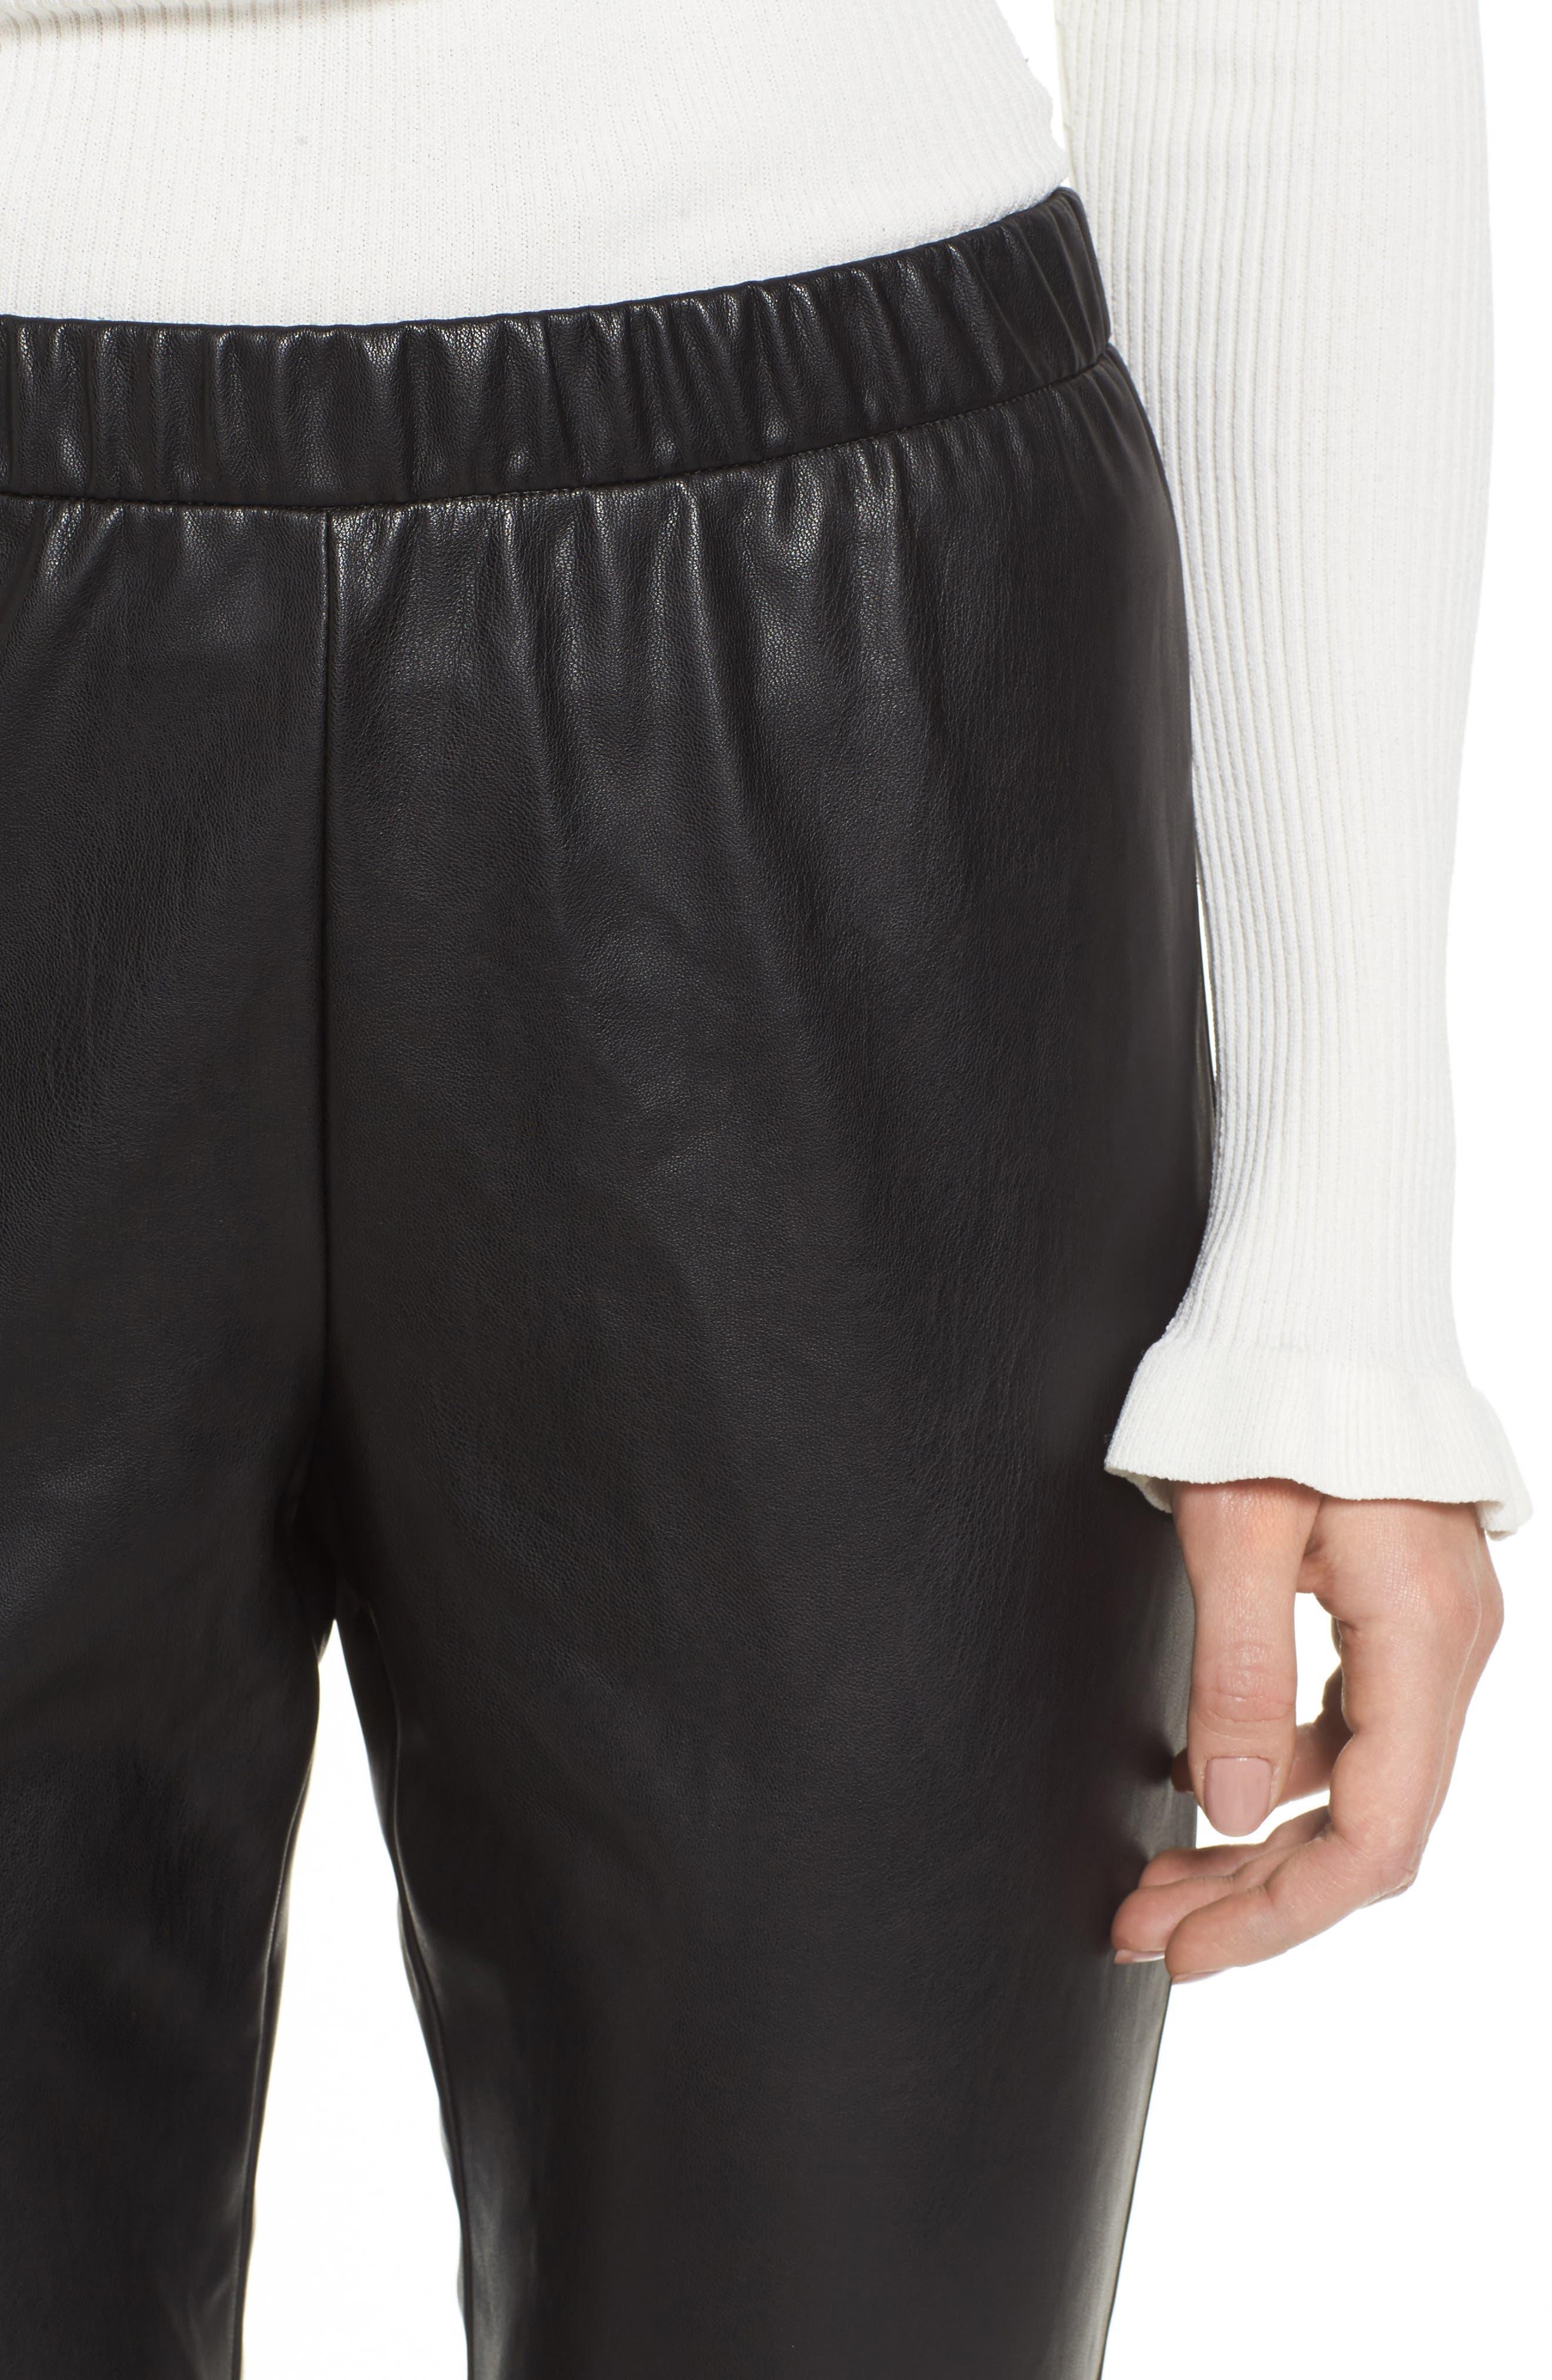 Zowie Faux Leather Pants,                             Alternate thumbnail 4, color,                             001